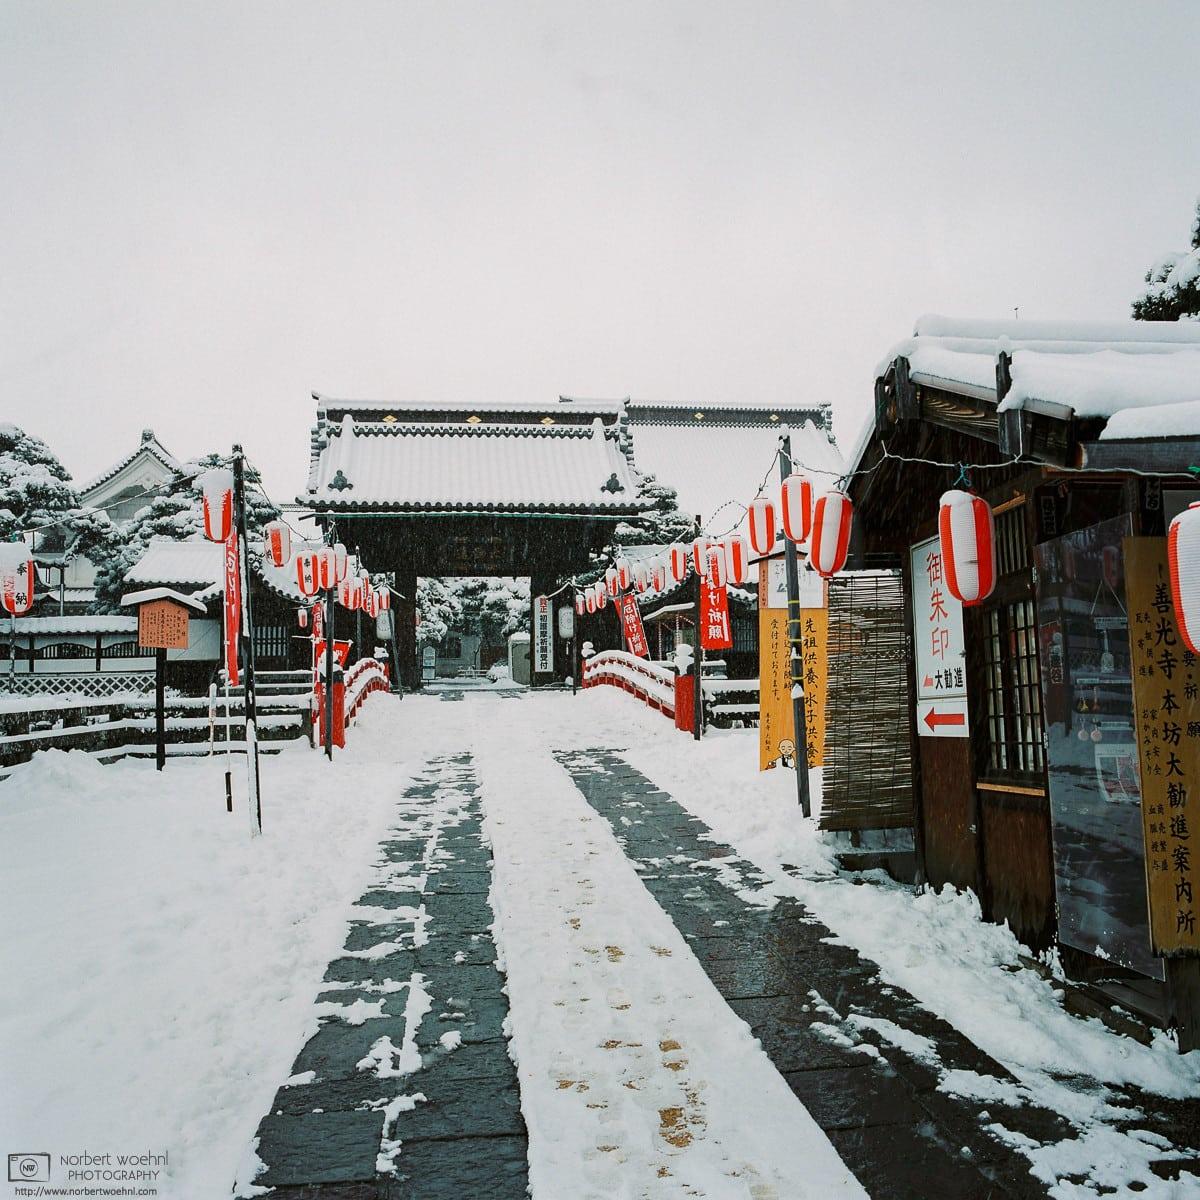 Snowy Side Temple Entrance, Zenkoji, Nagano, Japan Photo